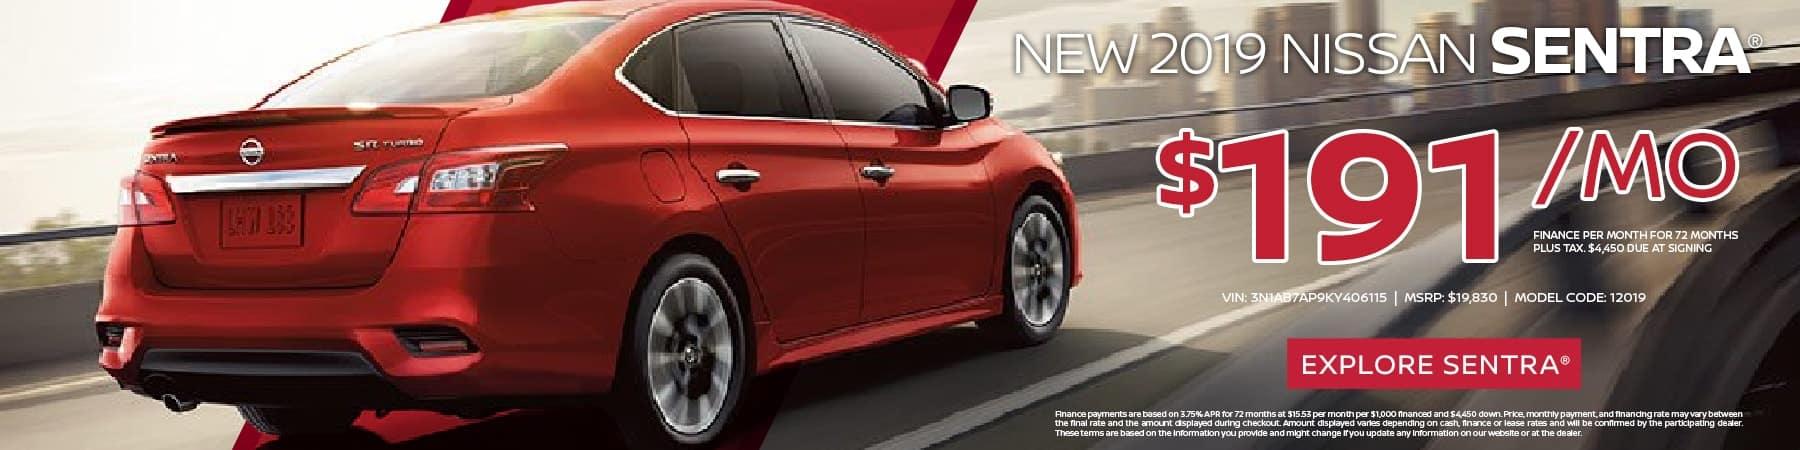 New 2019 Nissan Sentra S FWD 4D Sedan